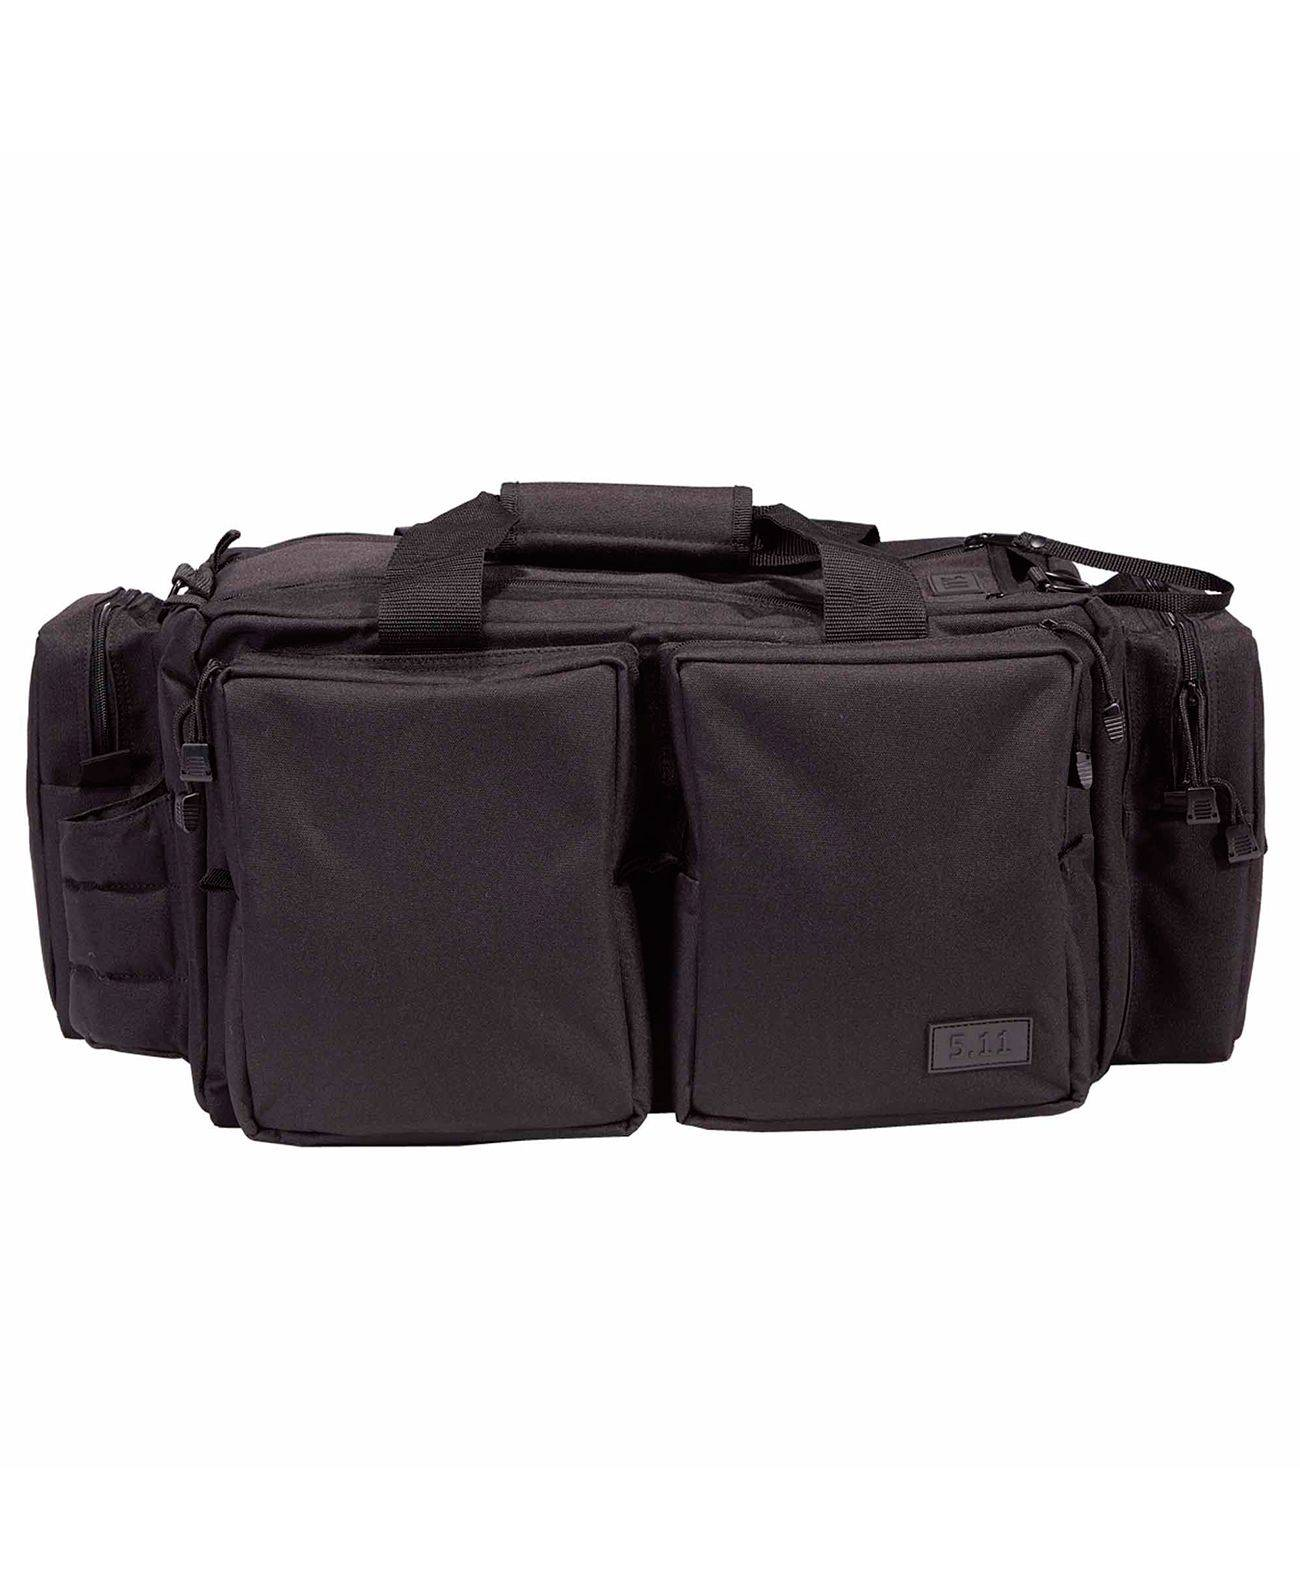 5.11 Tactical Range Ready - Bag - Svart